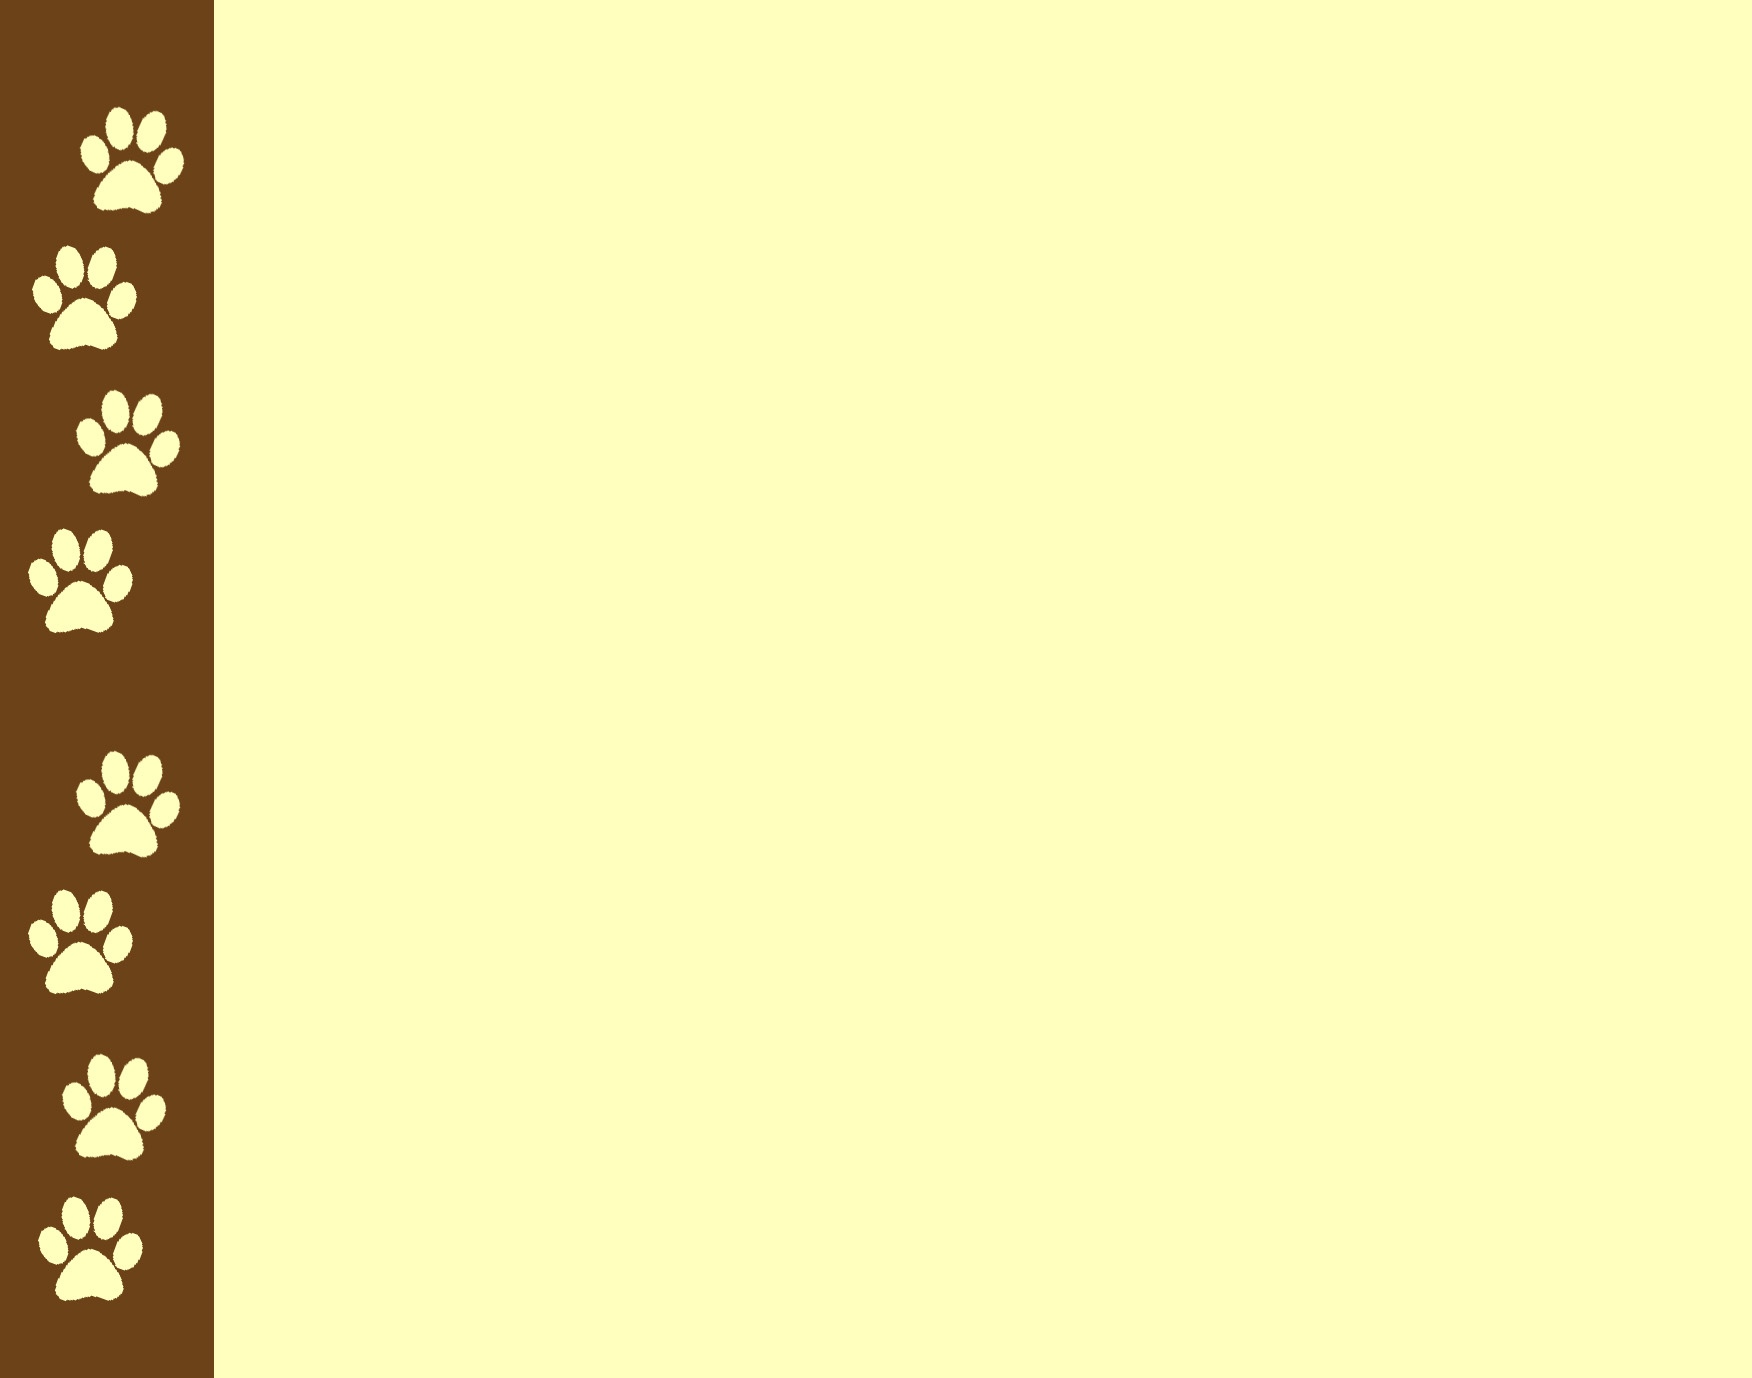 1752x1378px Dog Paw Print Wallpaper - WallpaperSafari